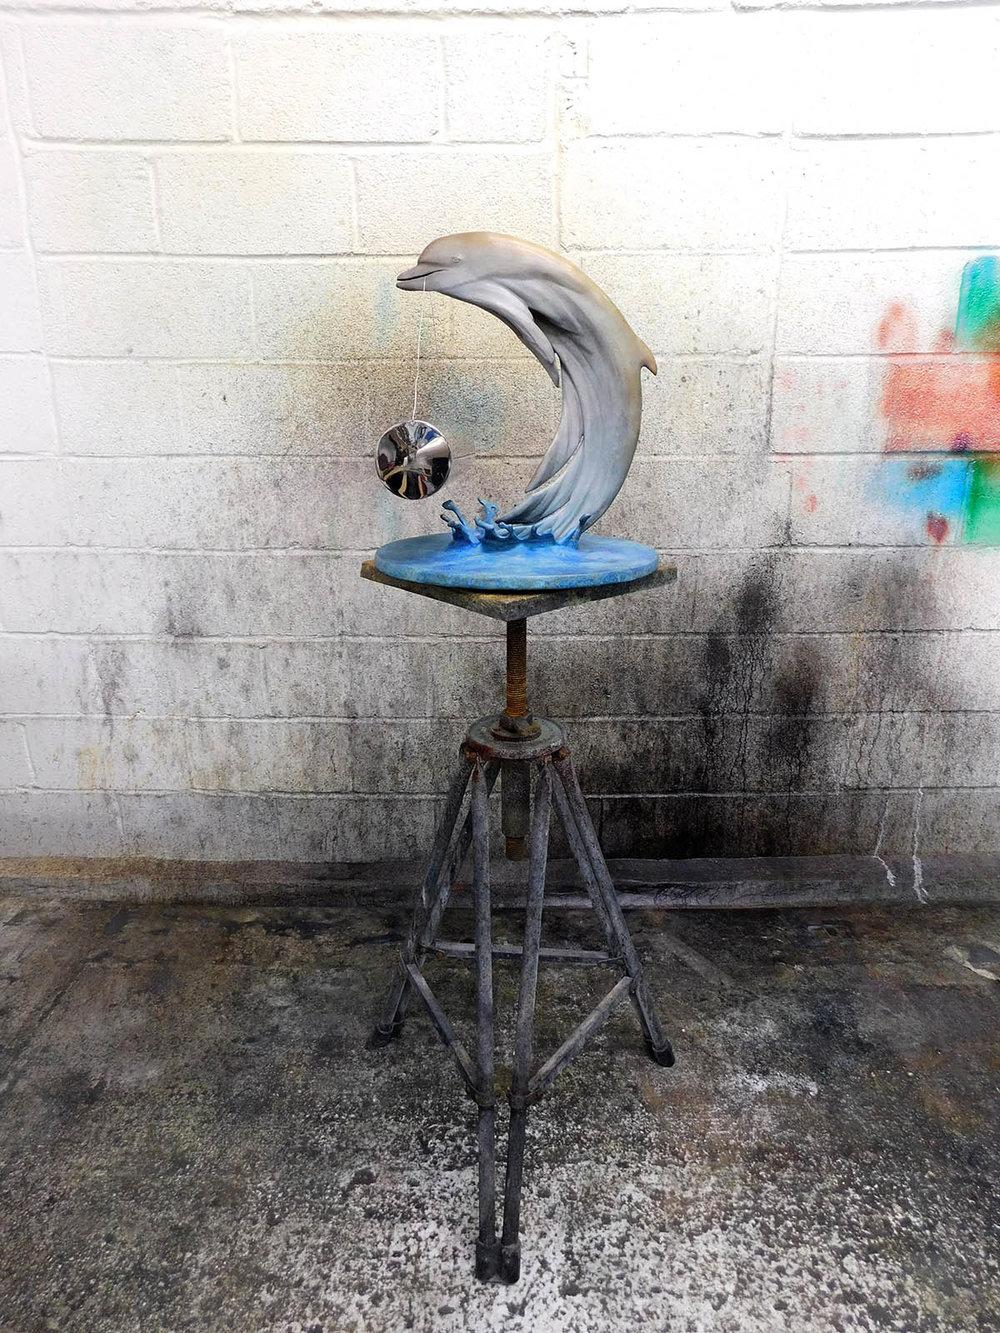 Dolphin-Jonty-Hurwitz-2.jpg